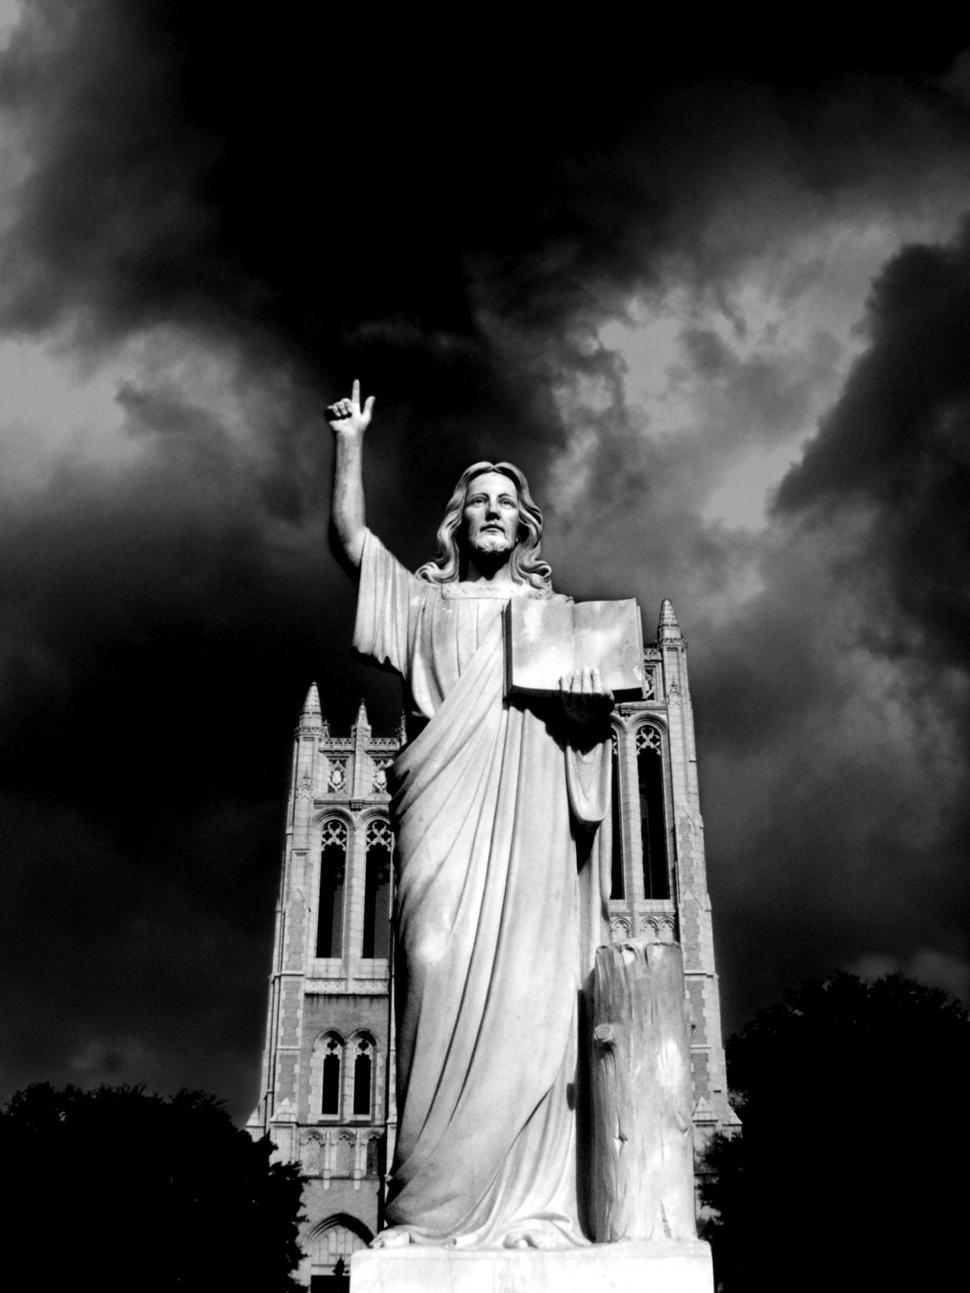 Download Free Stock Photo of Jesus and Dark Sky